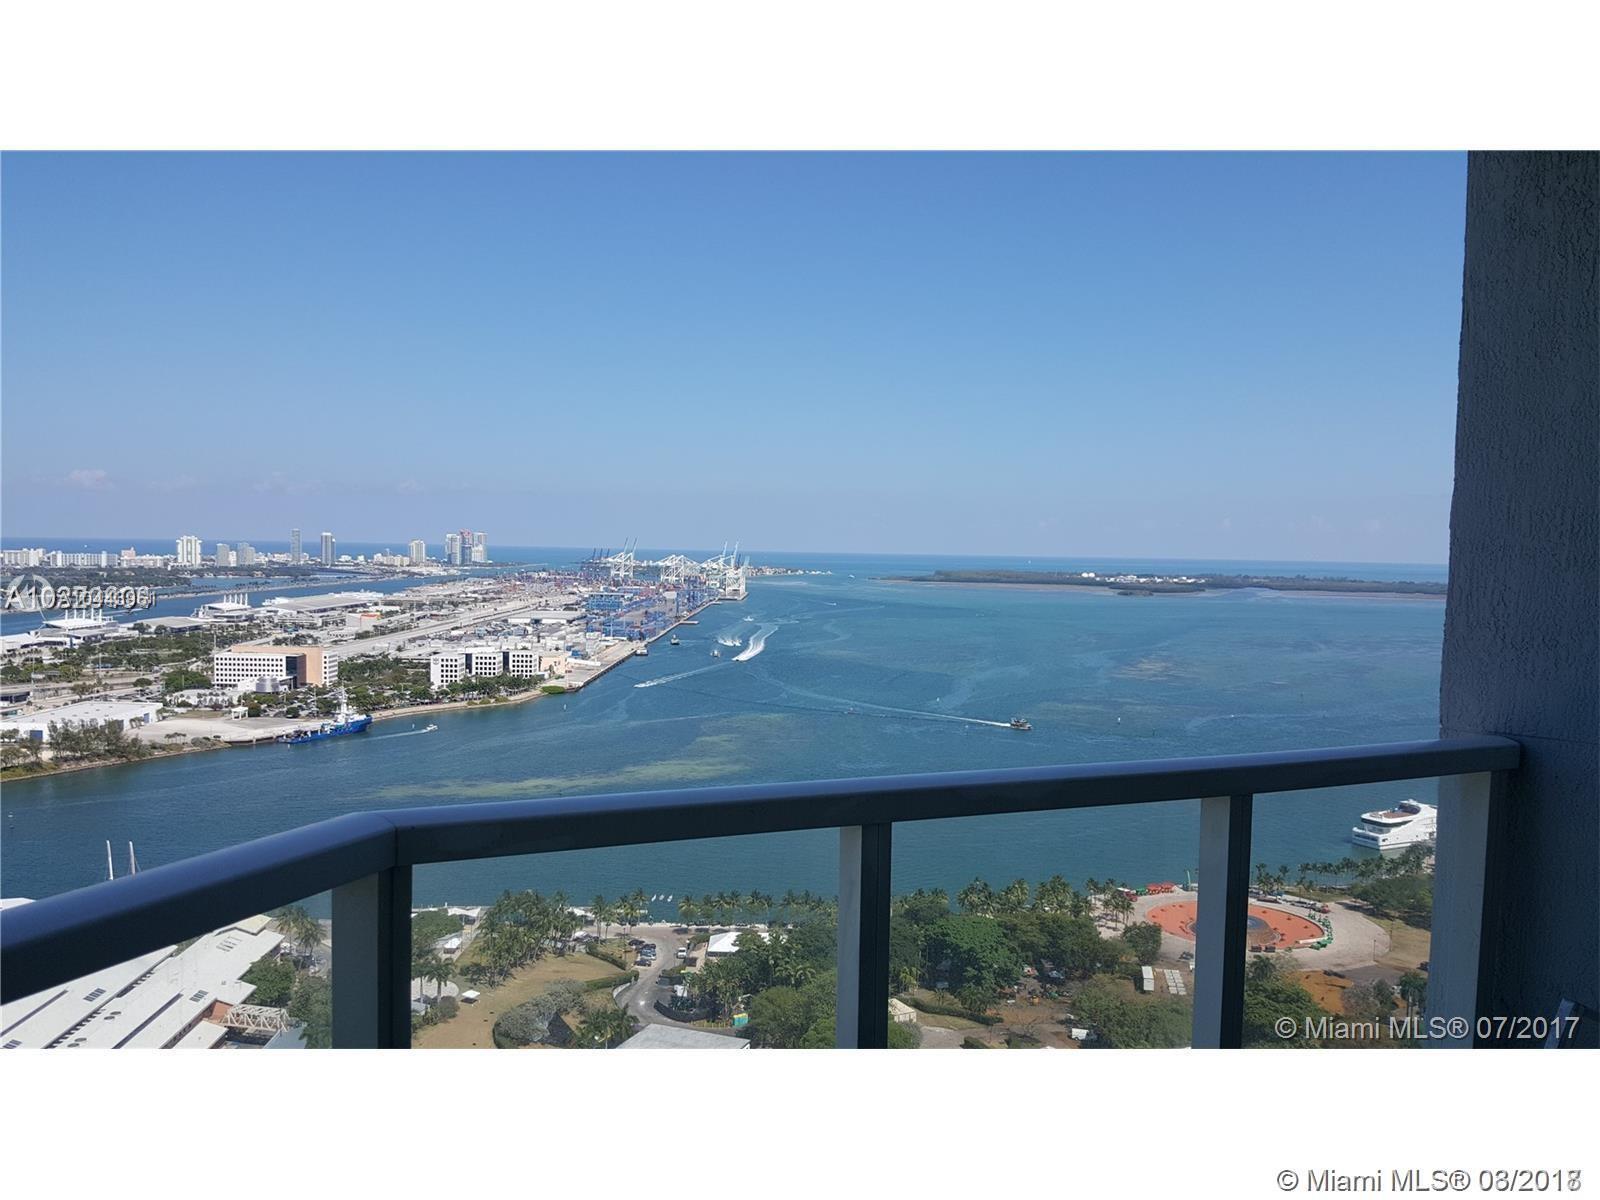 Vizcayne One #3702 - 244 Biscayne Blvd #3702, Miami, FL 33132